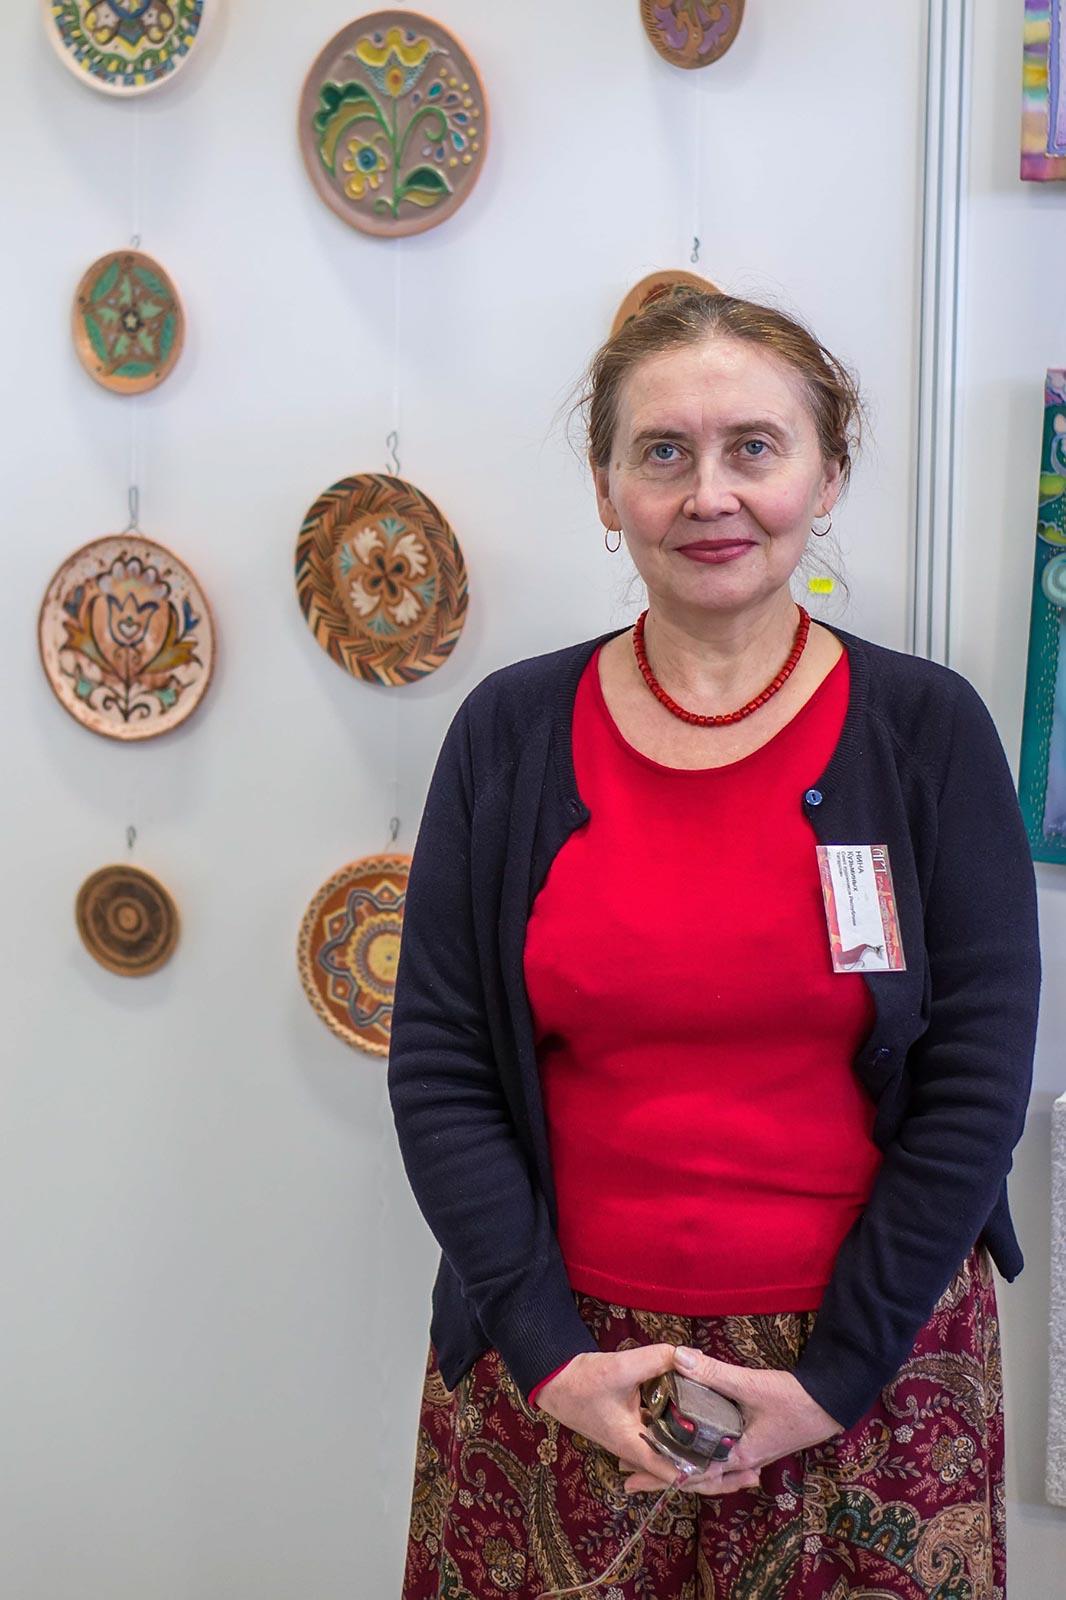 Фото №140061. Нина Кузьминых на «Арт-галерее. Казань — 2013»